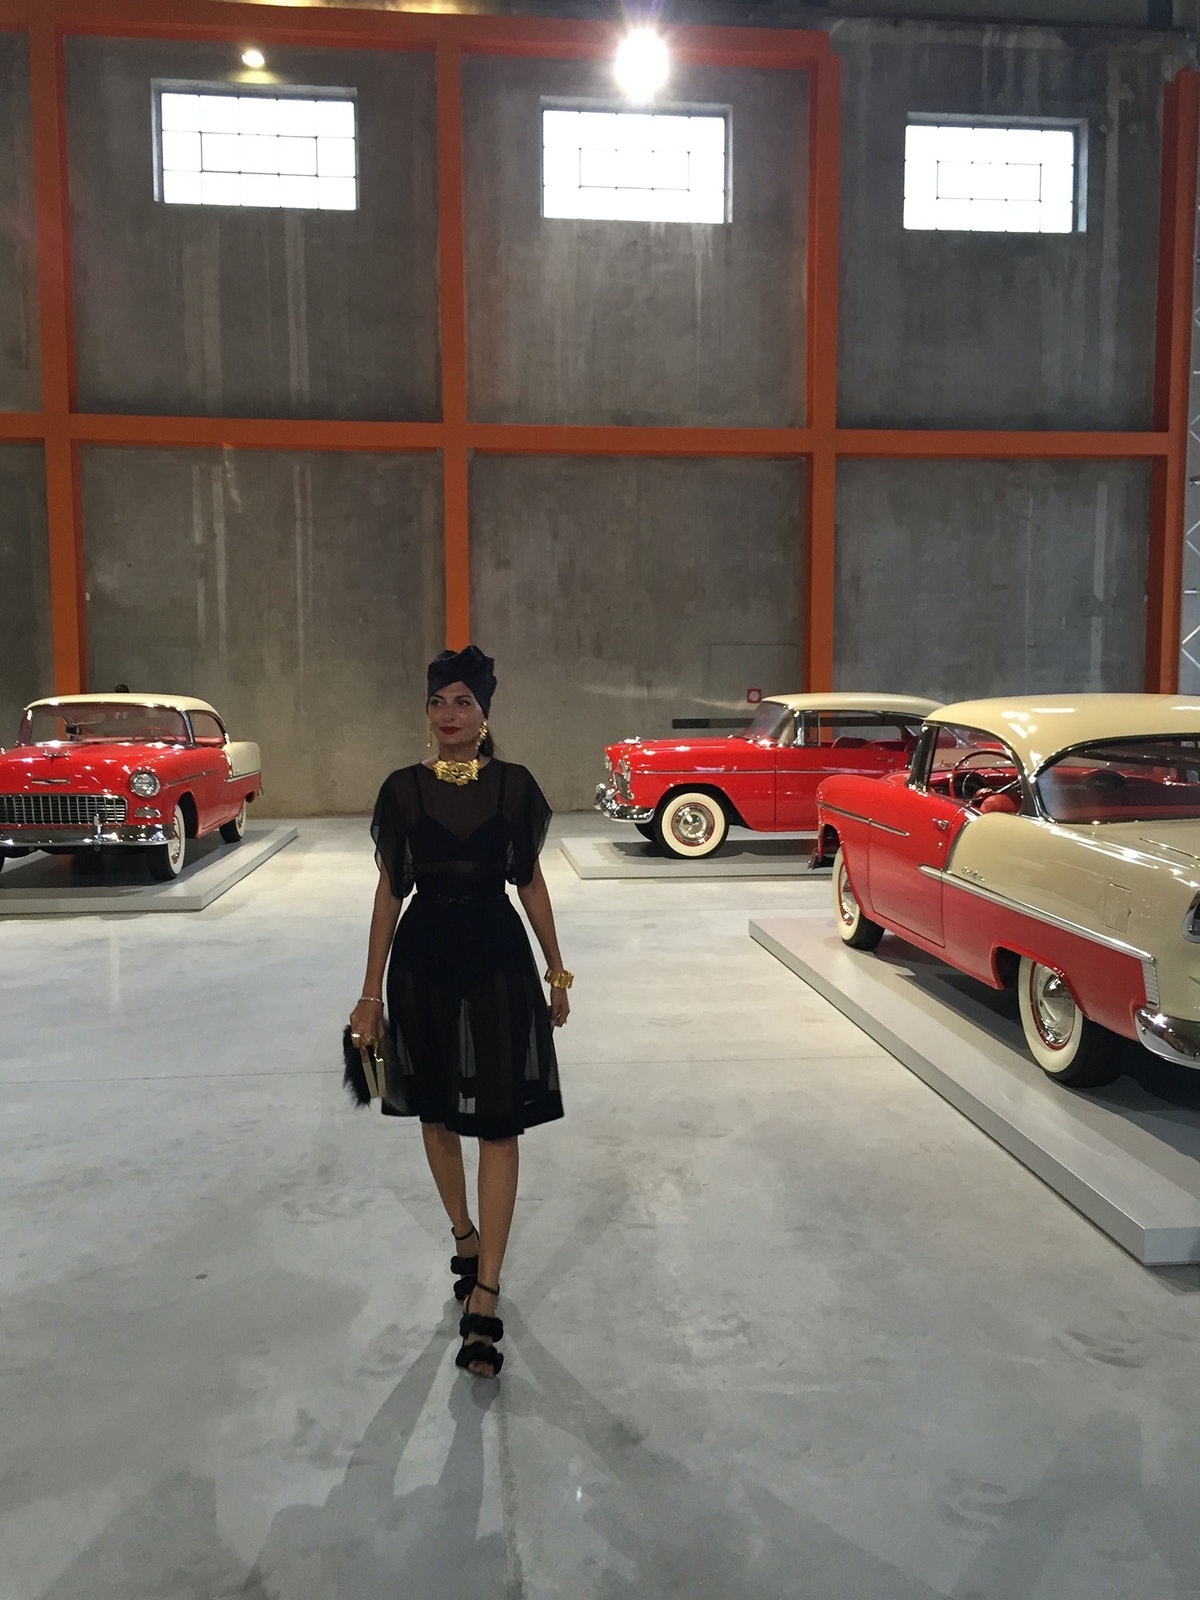 Fondazione Prada museum r